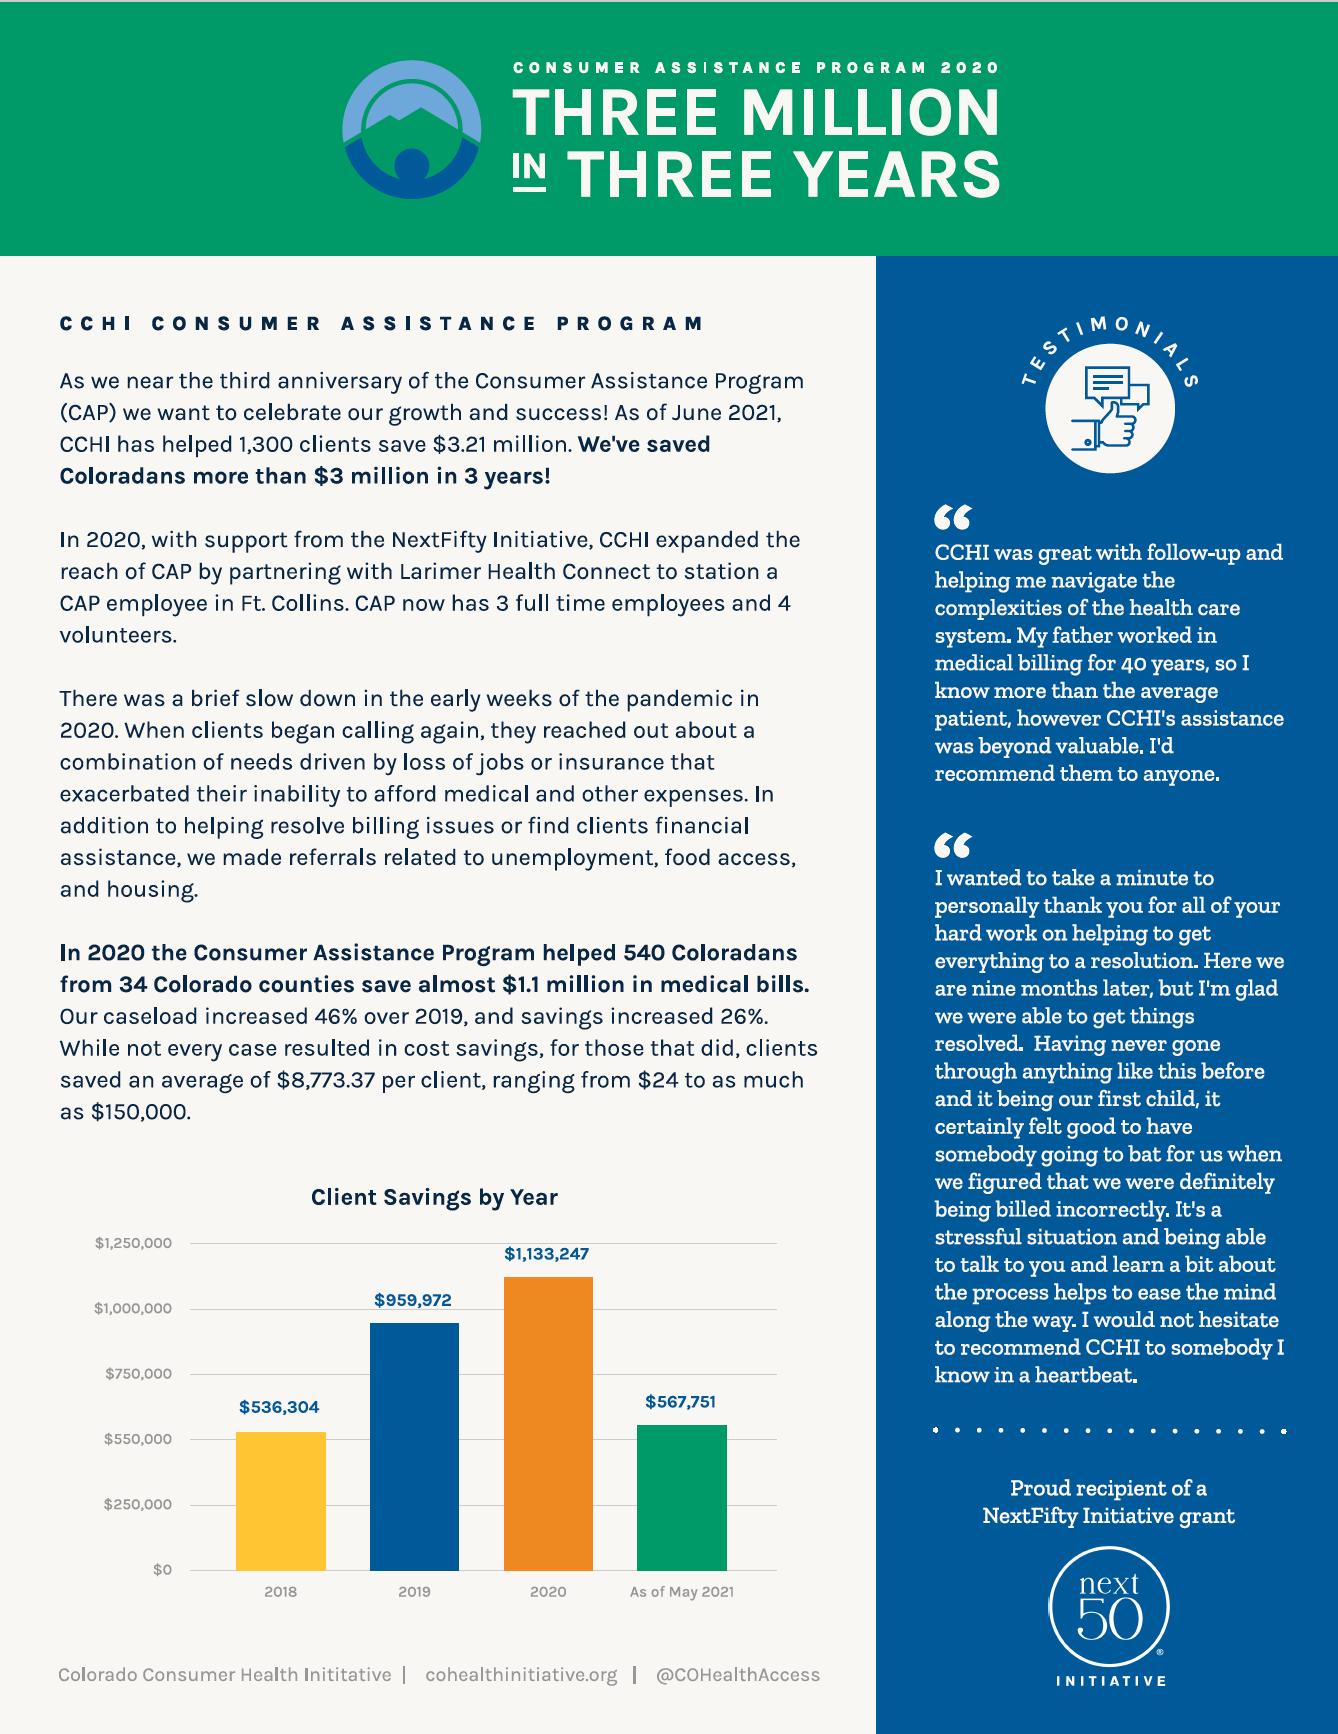 Consumer Assistance Program 2020 report